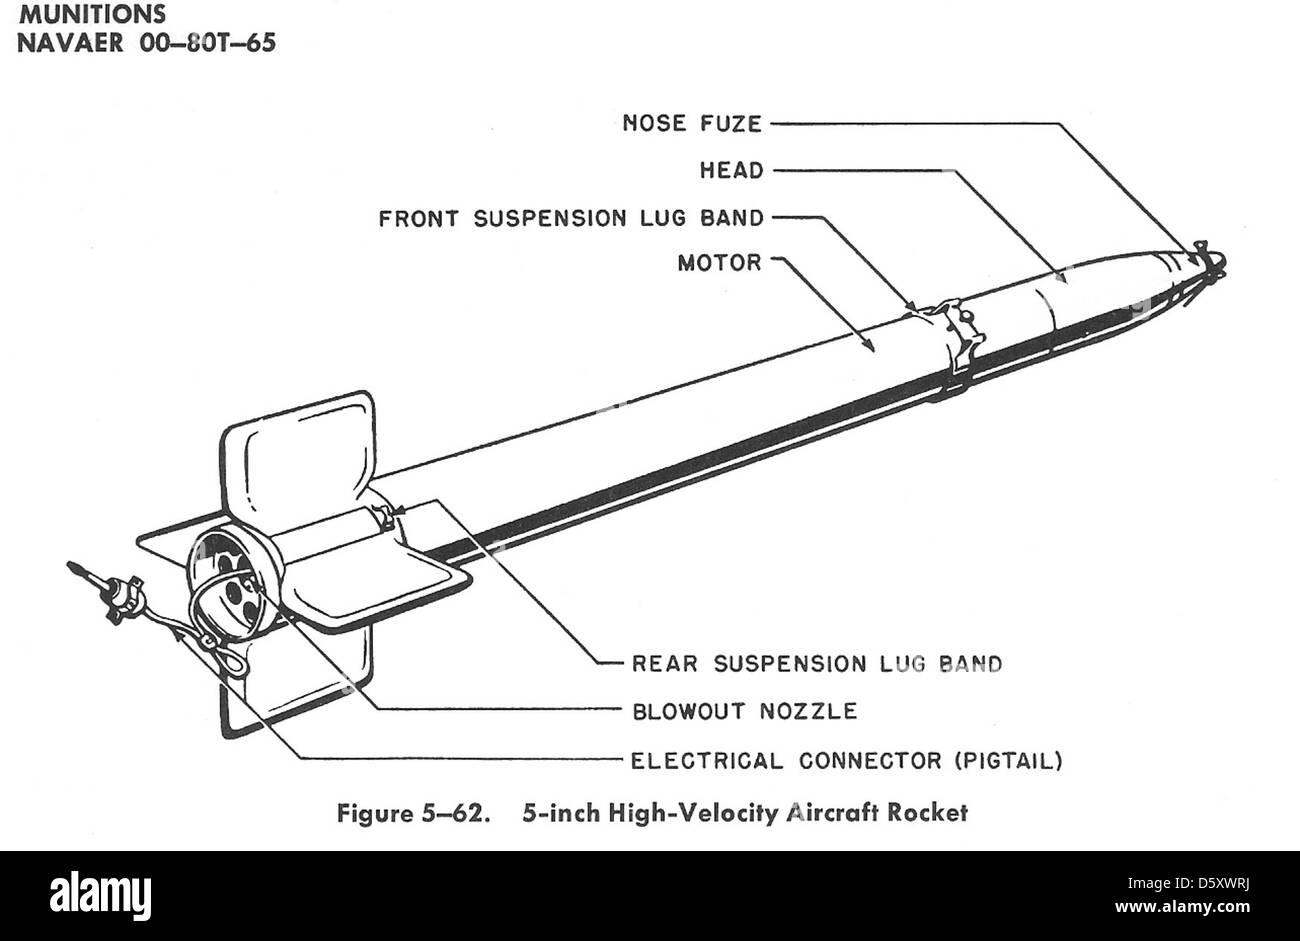 The 5-inch High Velocity Aircraft Rocket (HVAR Stock Photo